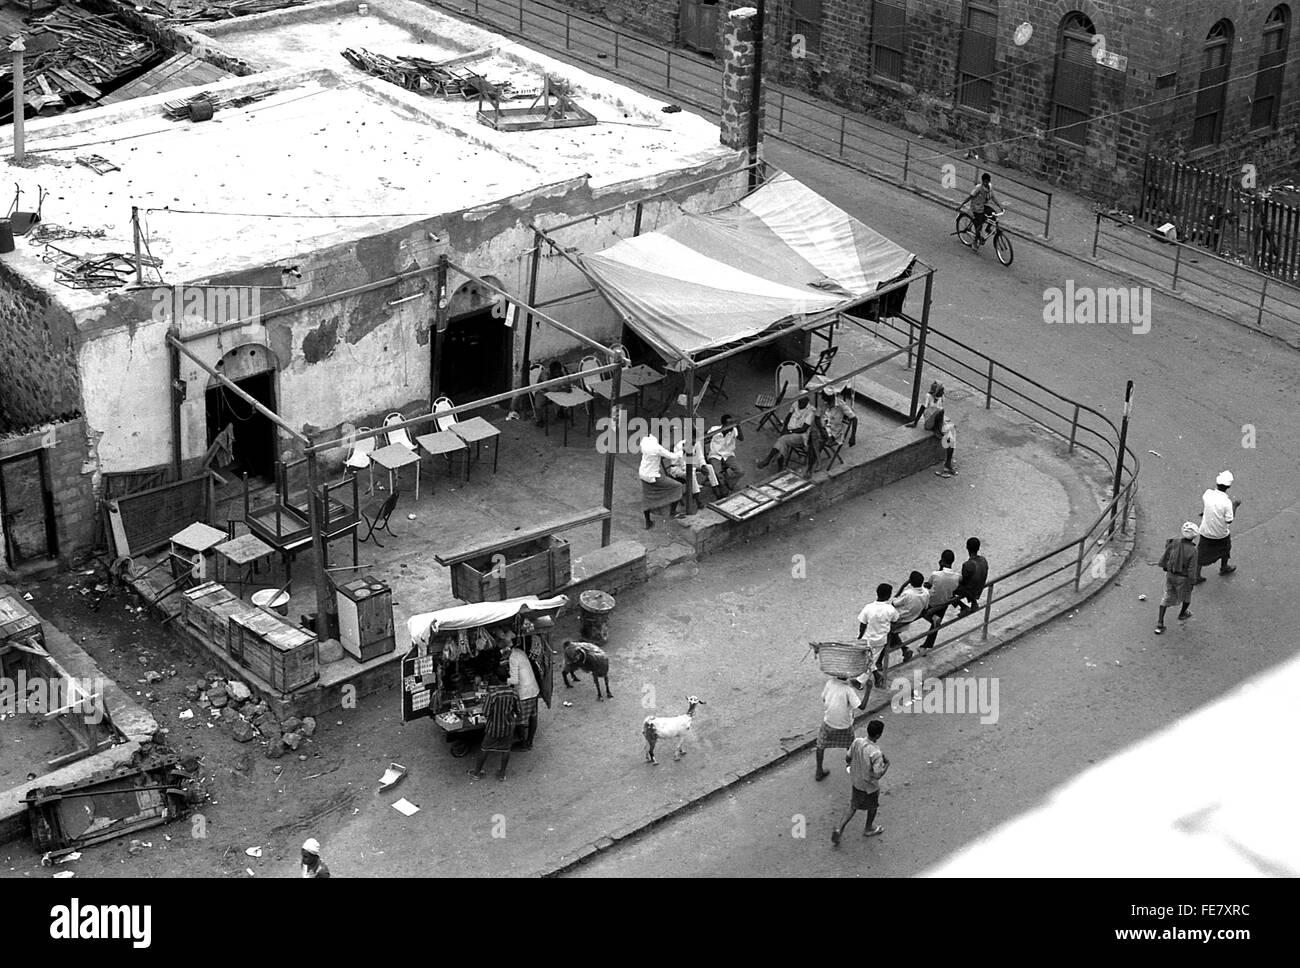 Coffee shop trader goats Aden Yemen 1967  British withdrawal - Stock Image